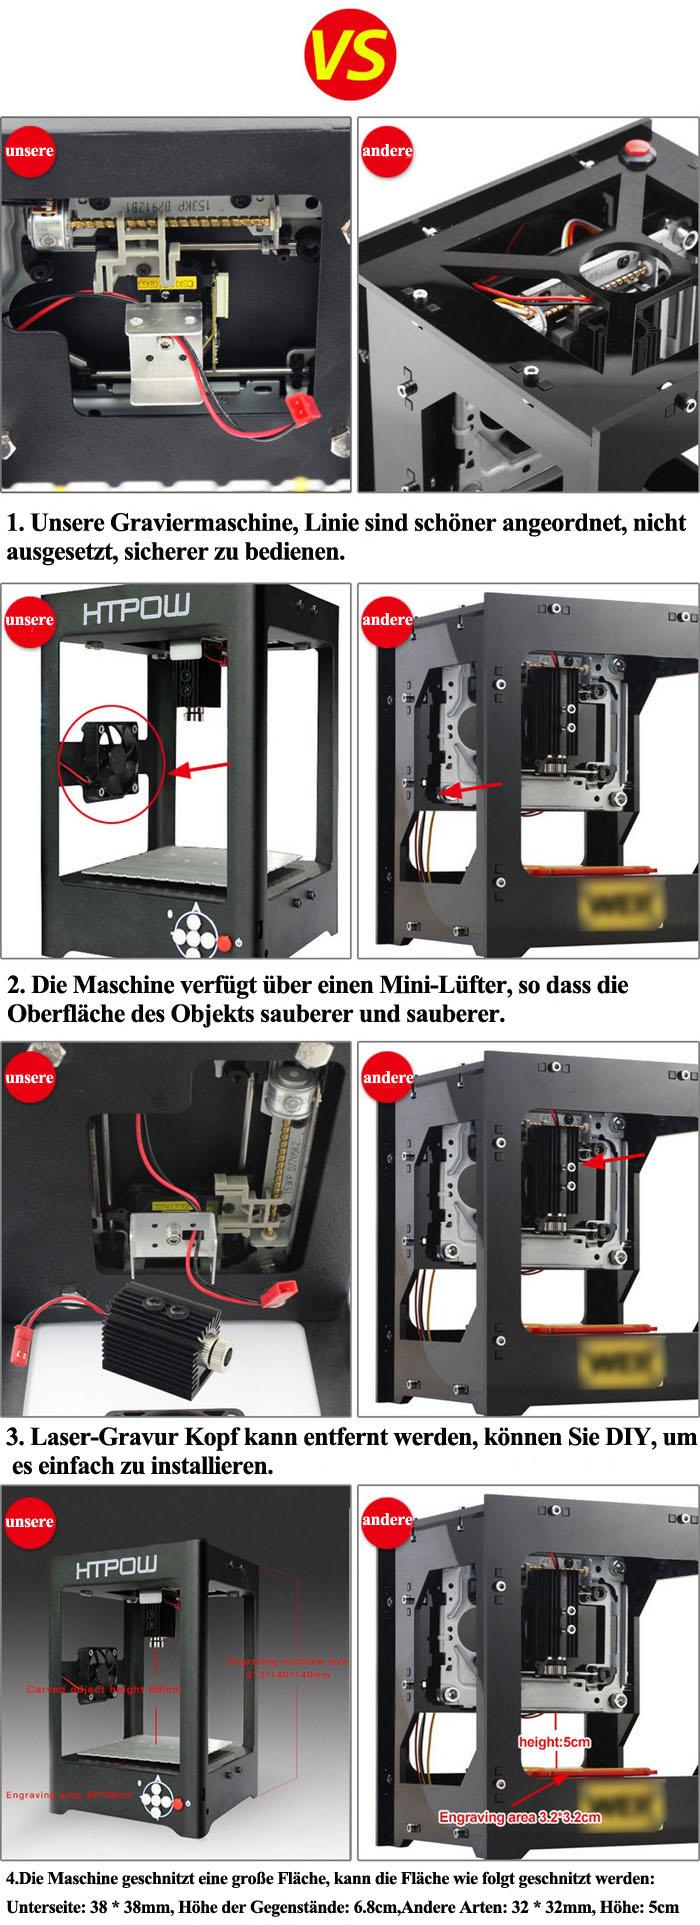 1000 mw Lasergravurmaschine